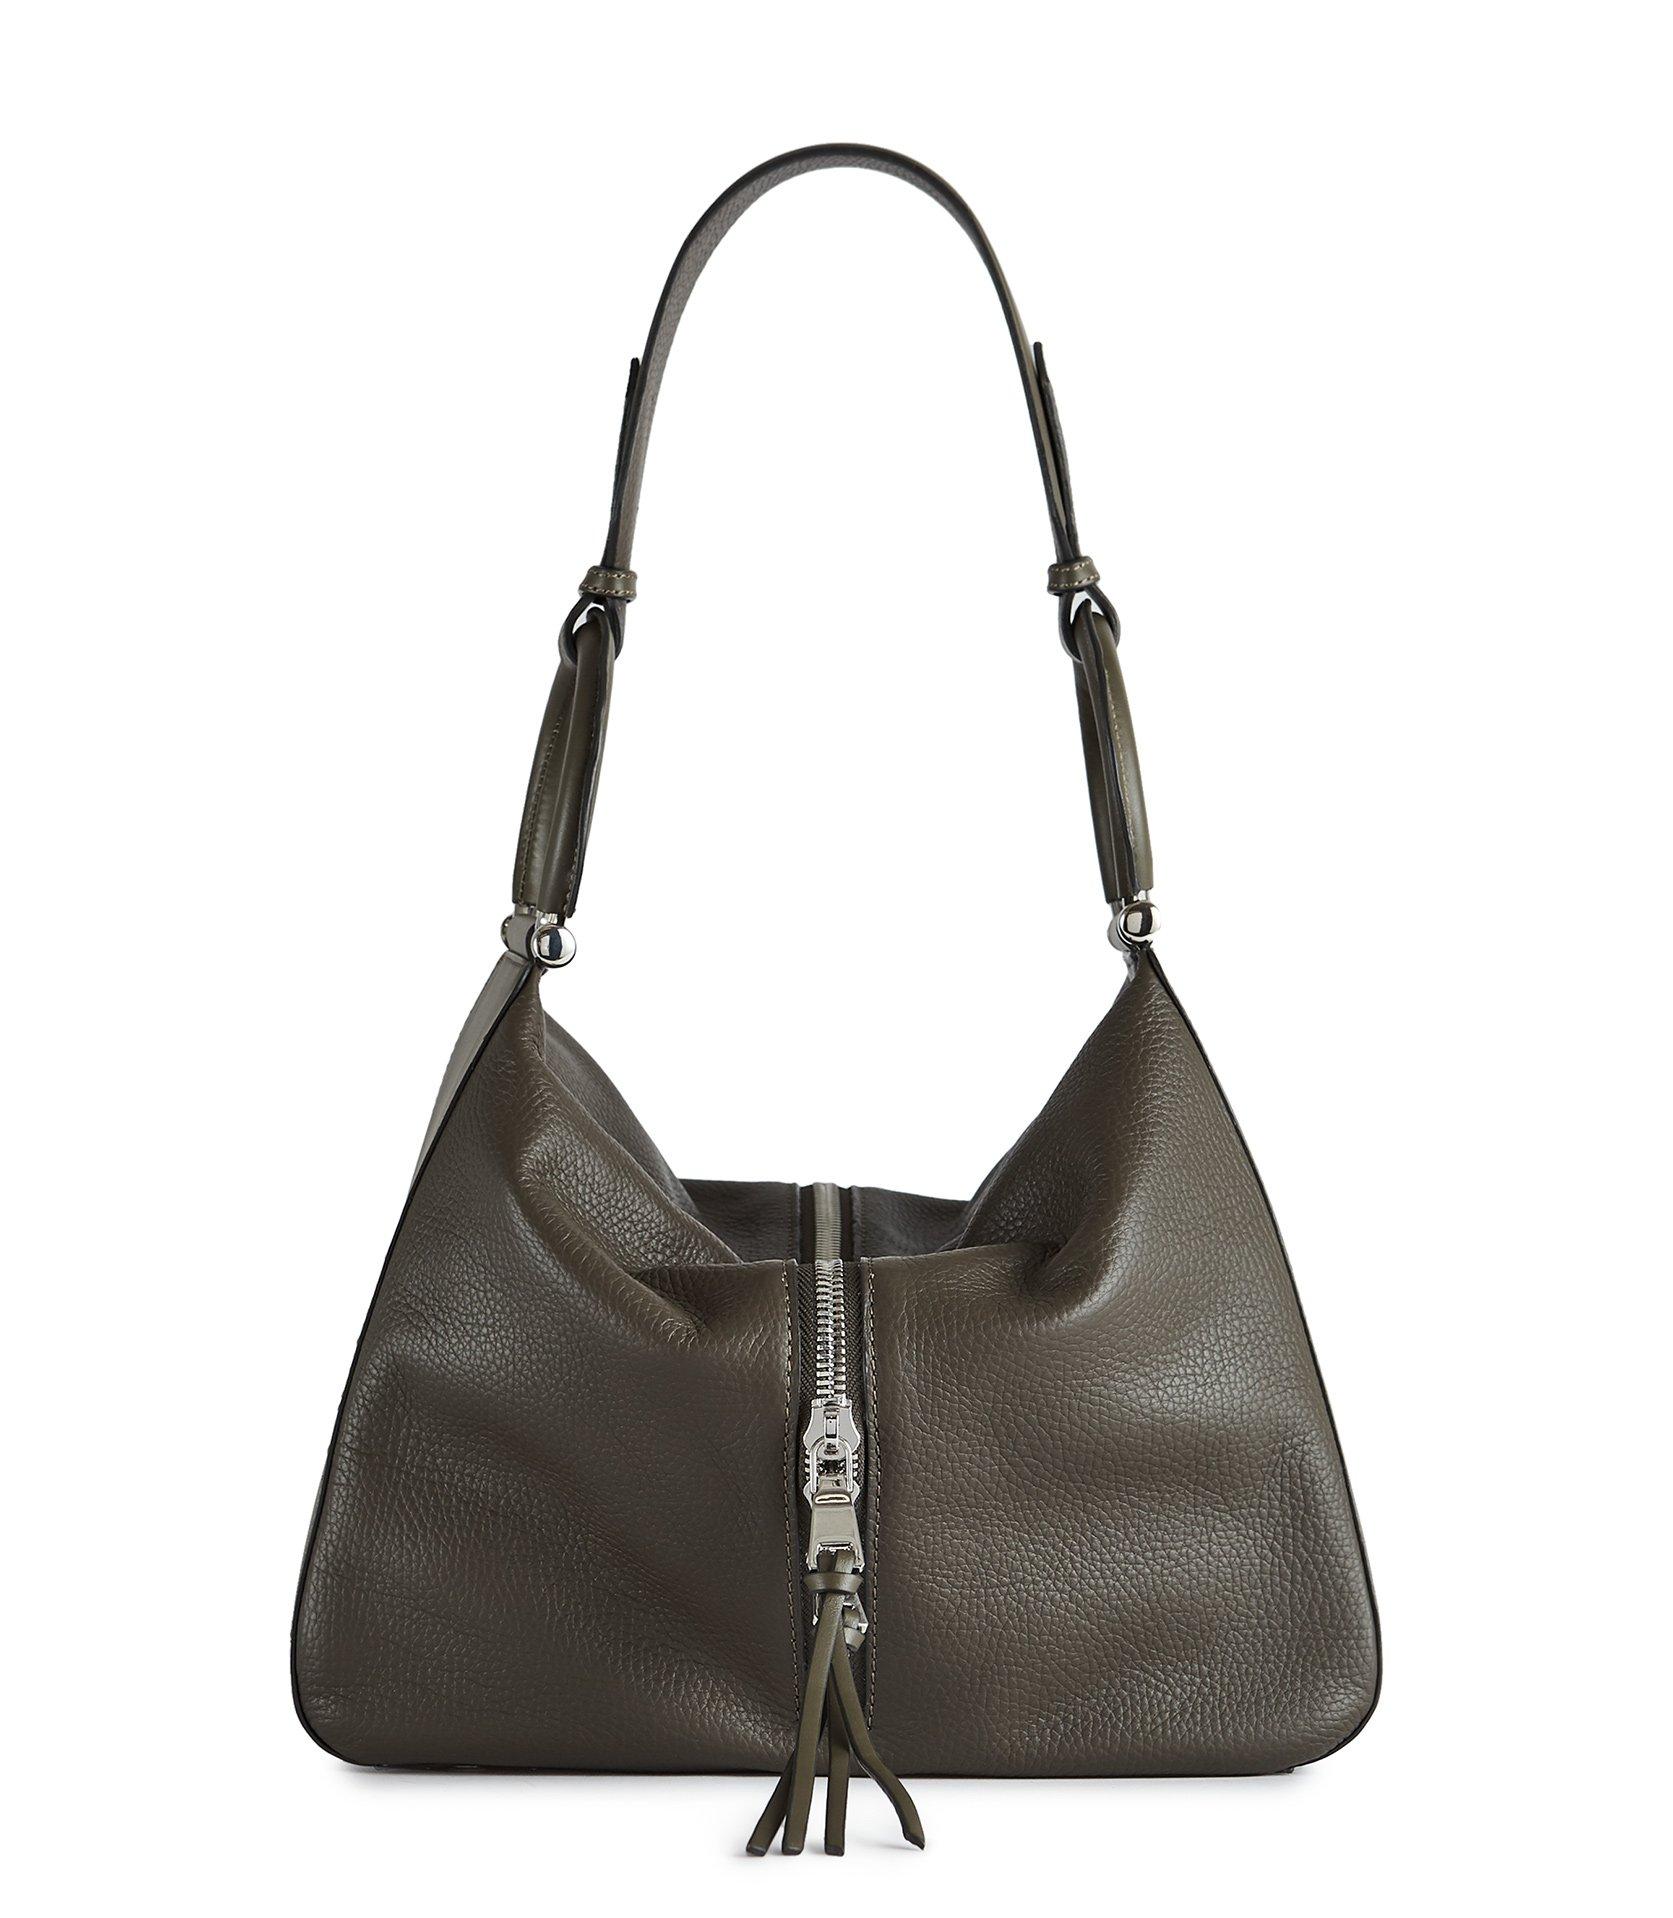 Broadwick Khaki Shoulder Bag, Dhs1,450.